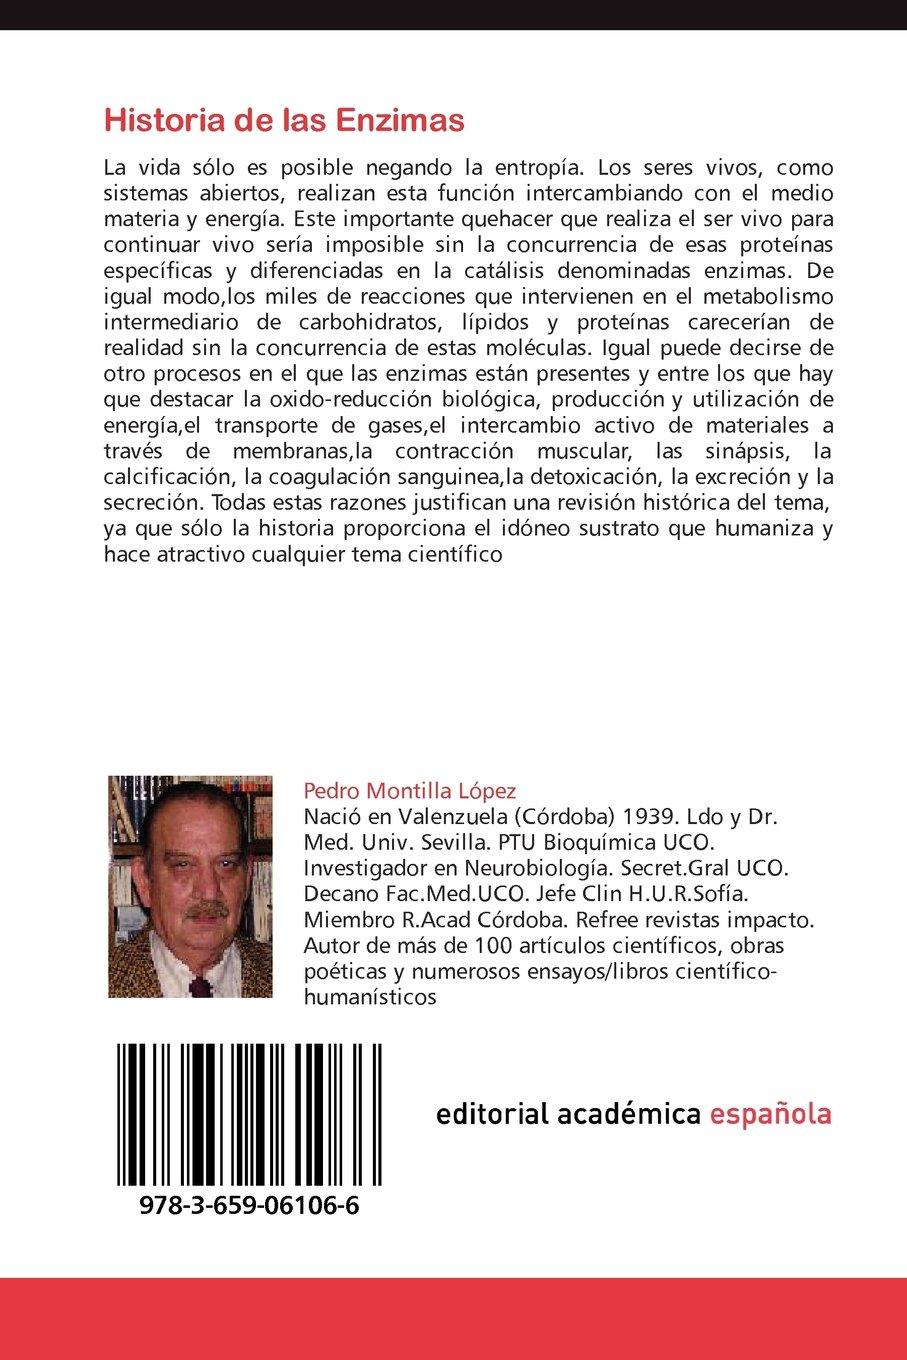 Historia de las Enzimas: De Fermentos a Enzimas- Catálisis ...